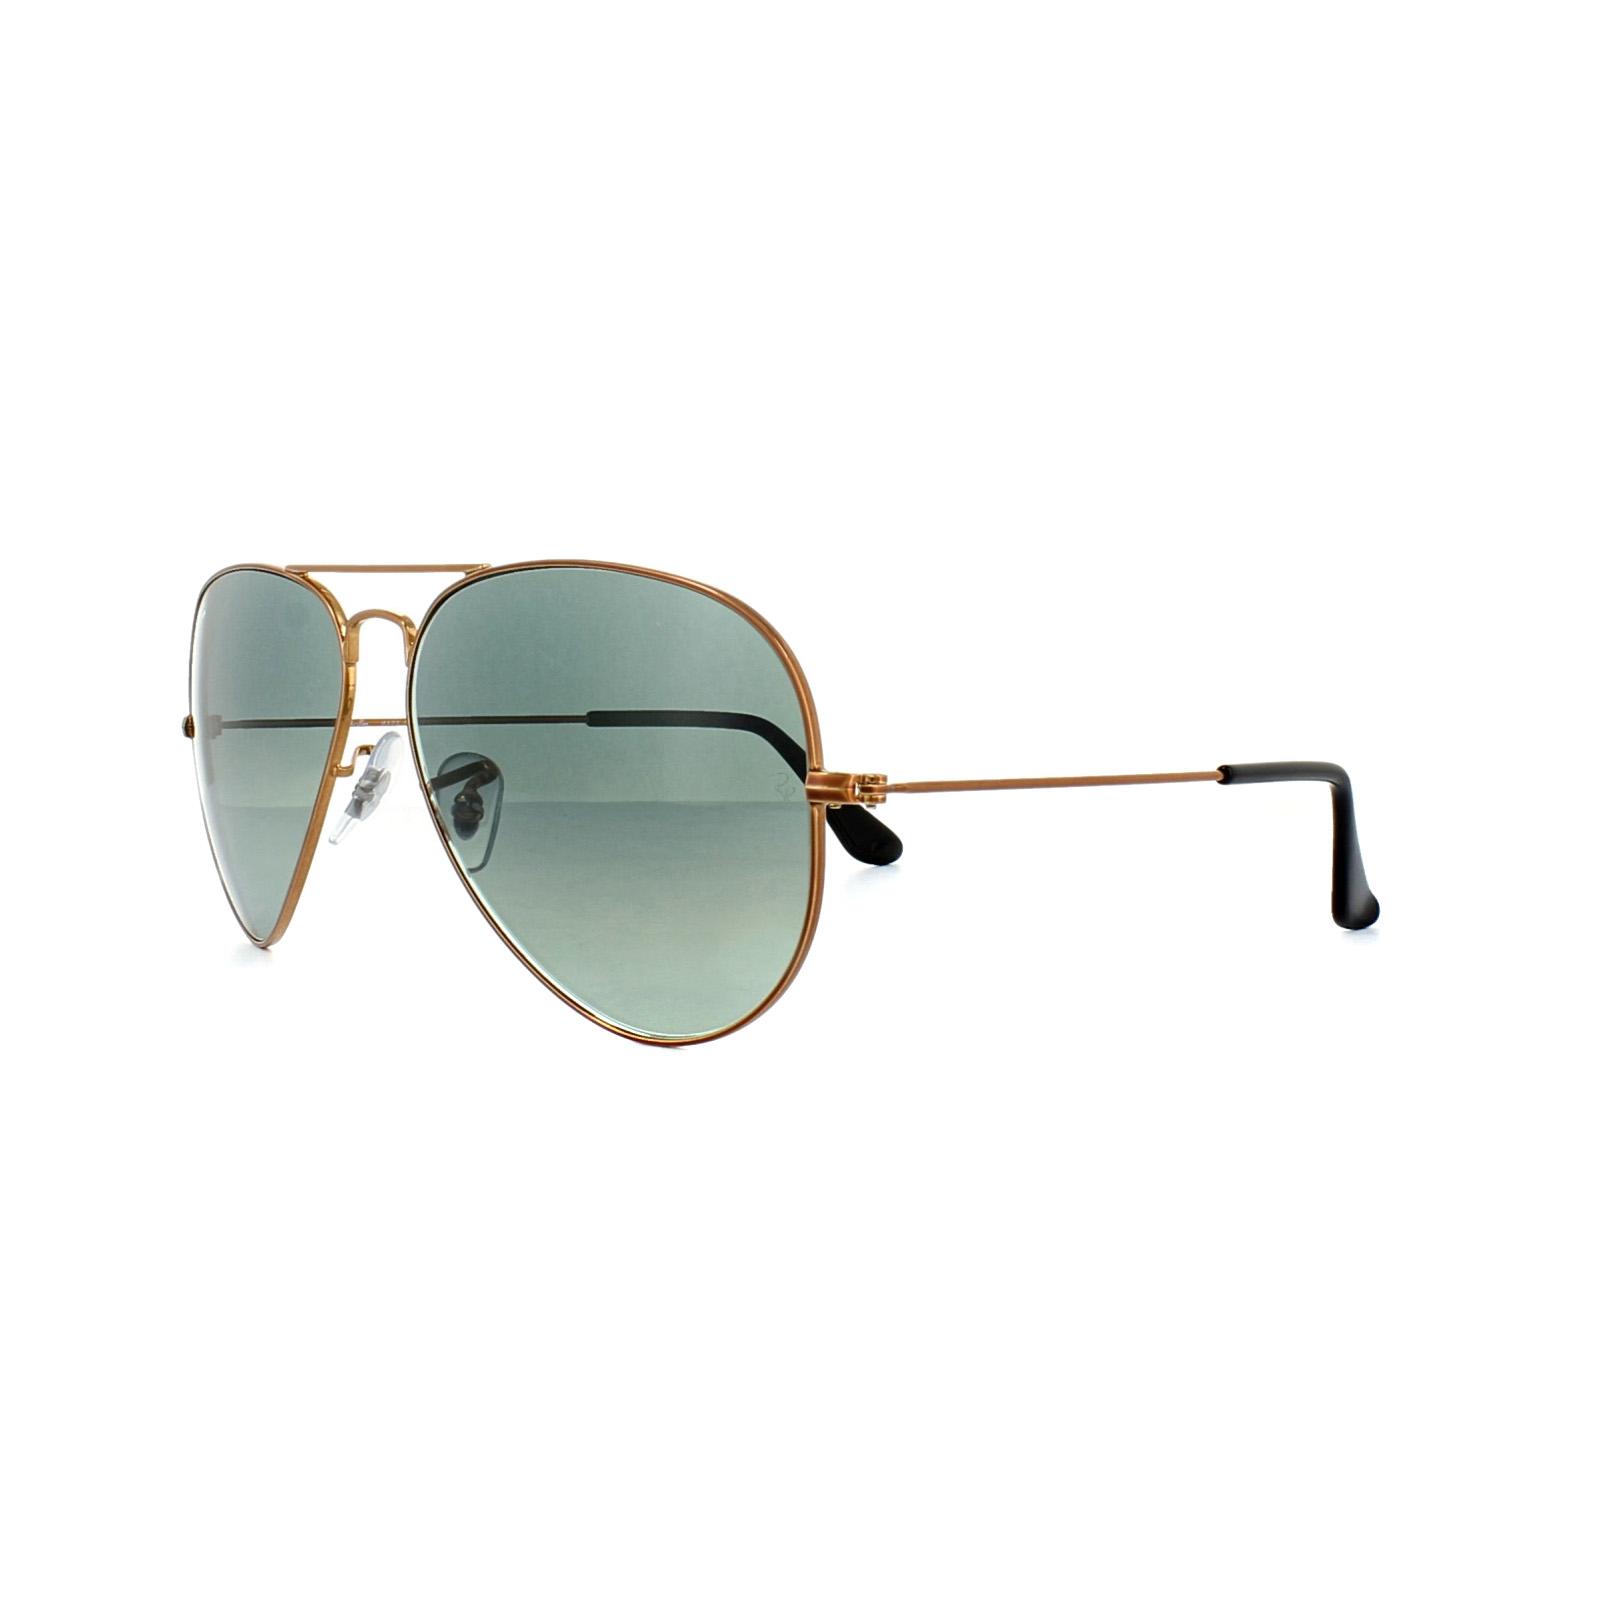 Sentinel Ray-Ban Sunglasses Aviator 3025 197 71 Bronze Copper Grey Gradient  Medium 58mm fba1e6a554a2